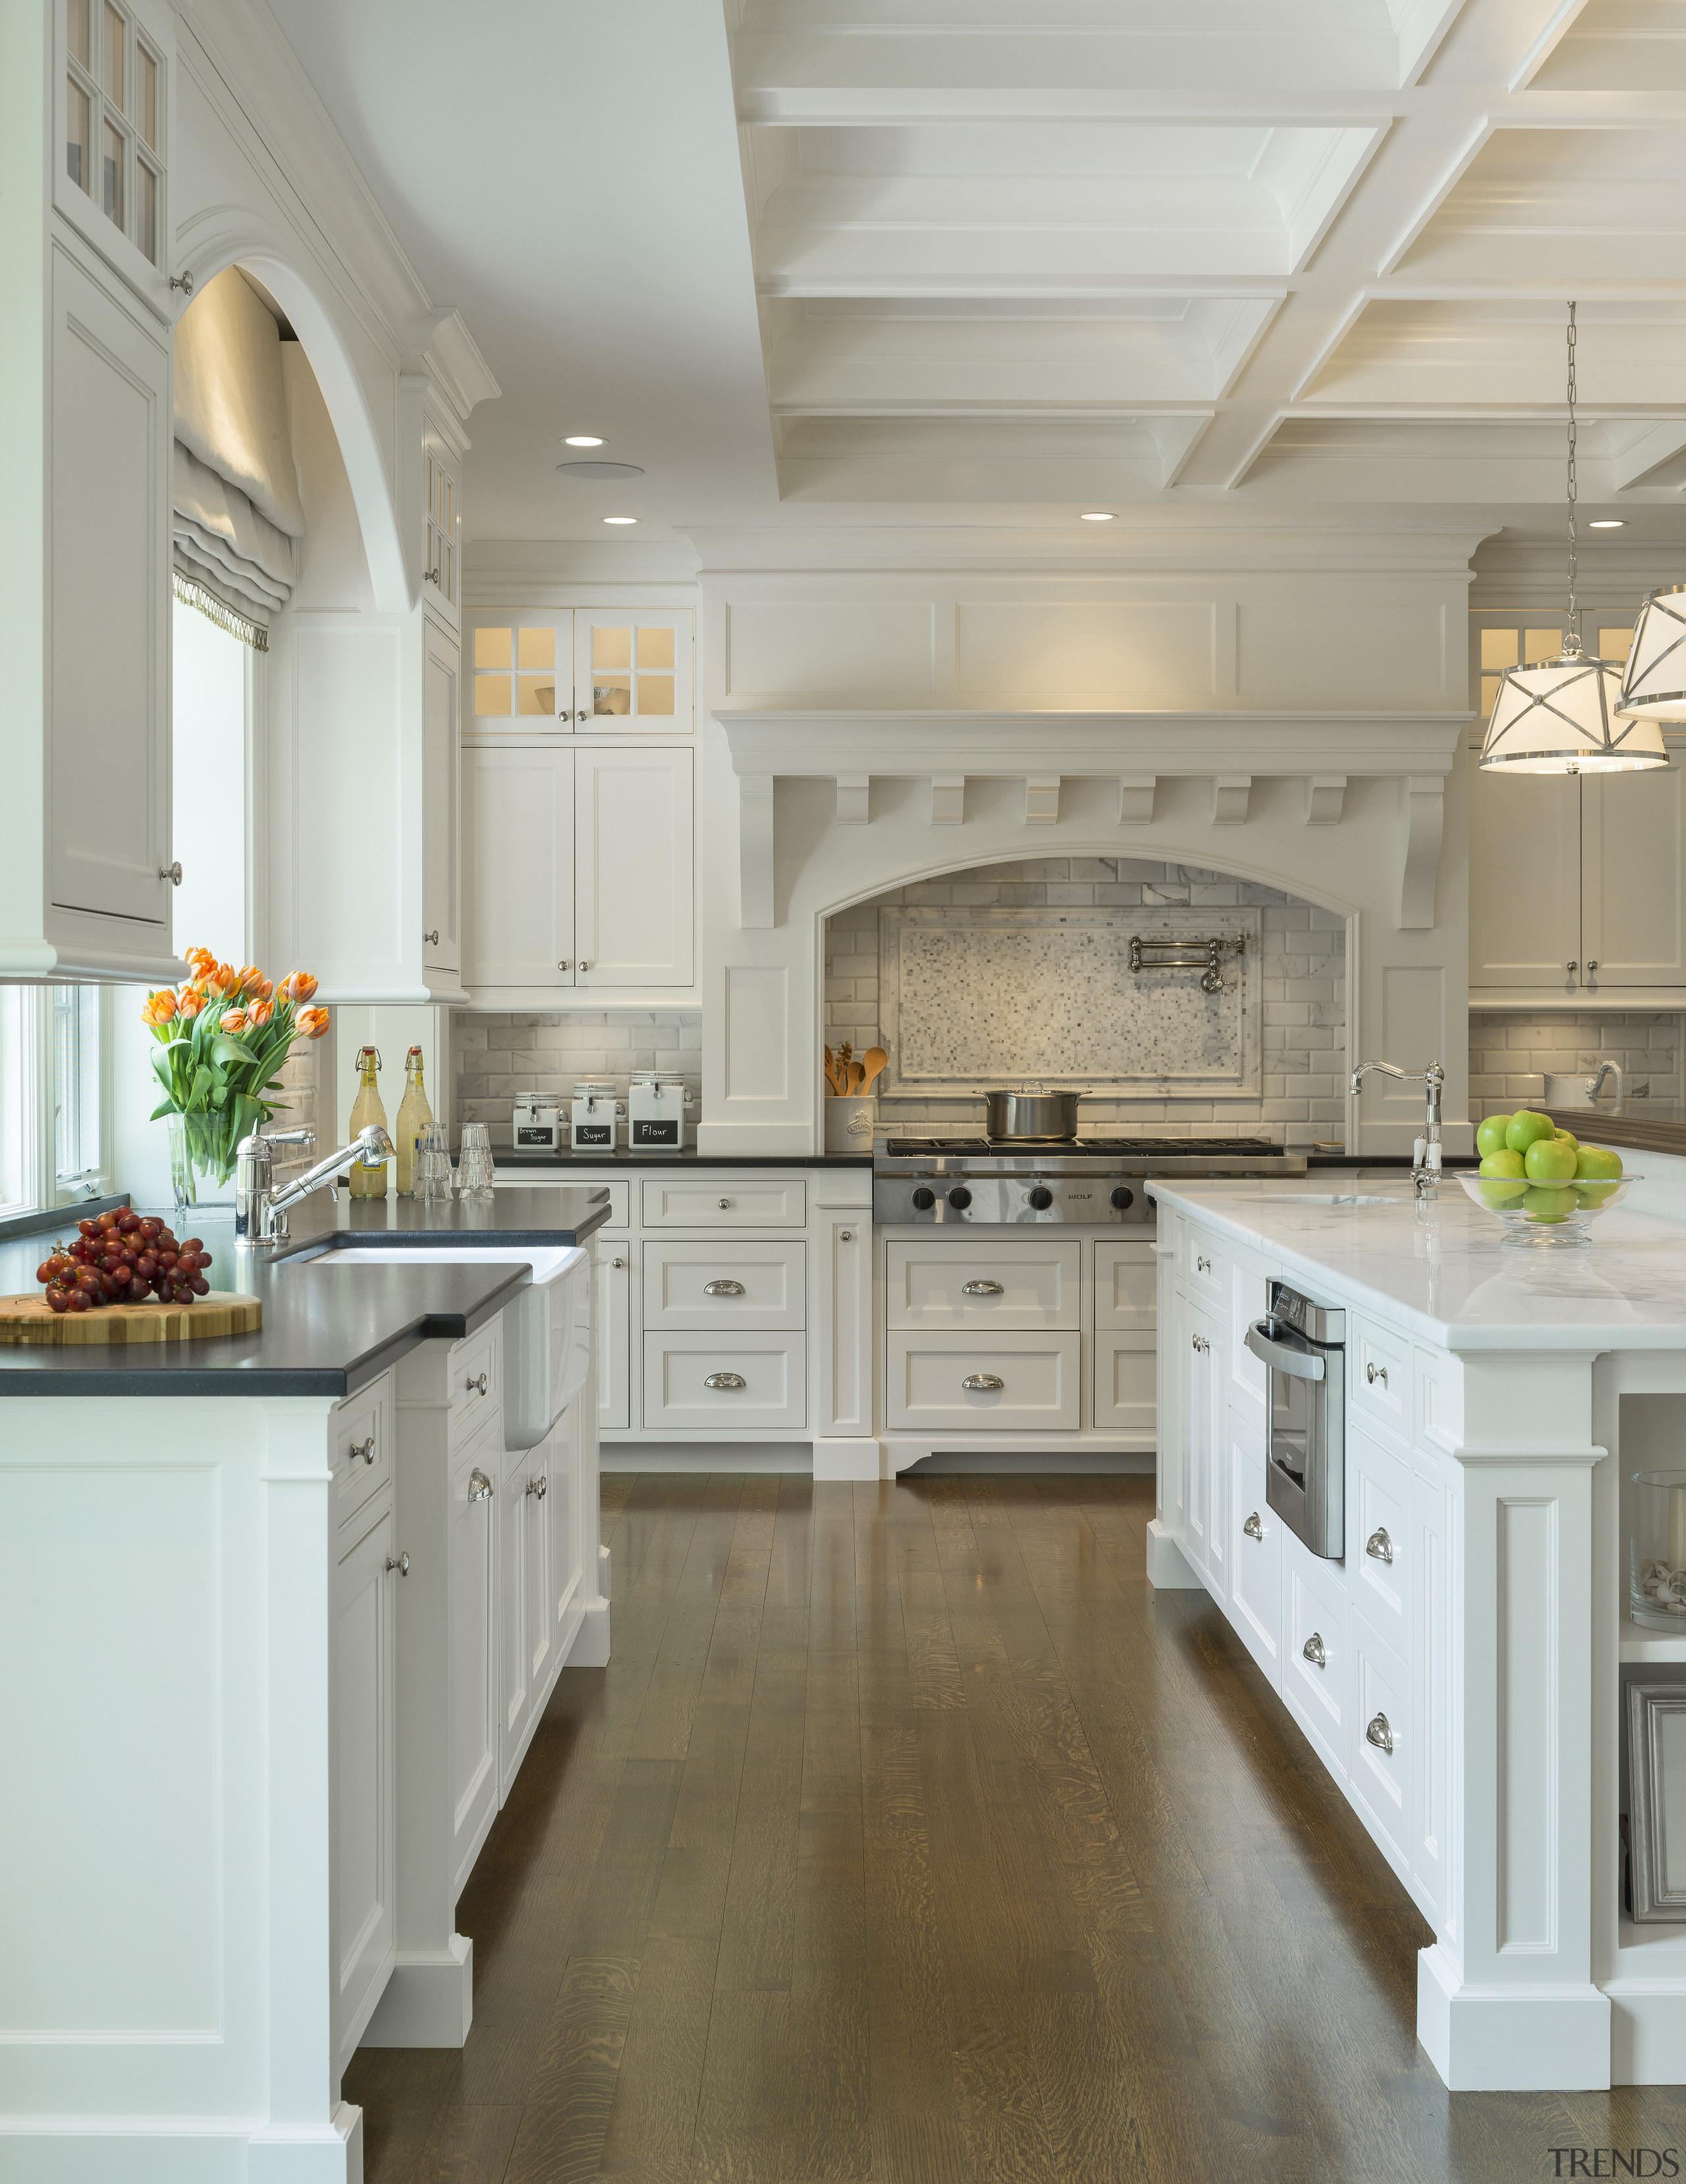 Dark hardwood floors anchor this all-white kitchen in cabinetry, ceiling, countertop, cuisine classique, floor, flooring, hardwood, home, interior design, kitchen, room, wood flooring, gray